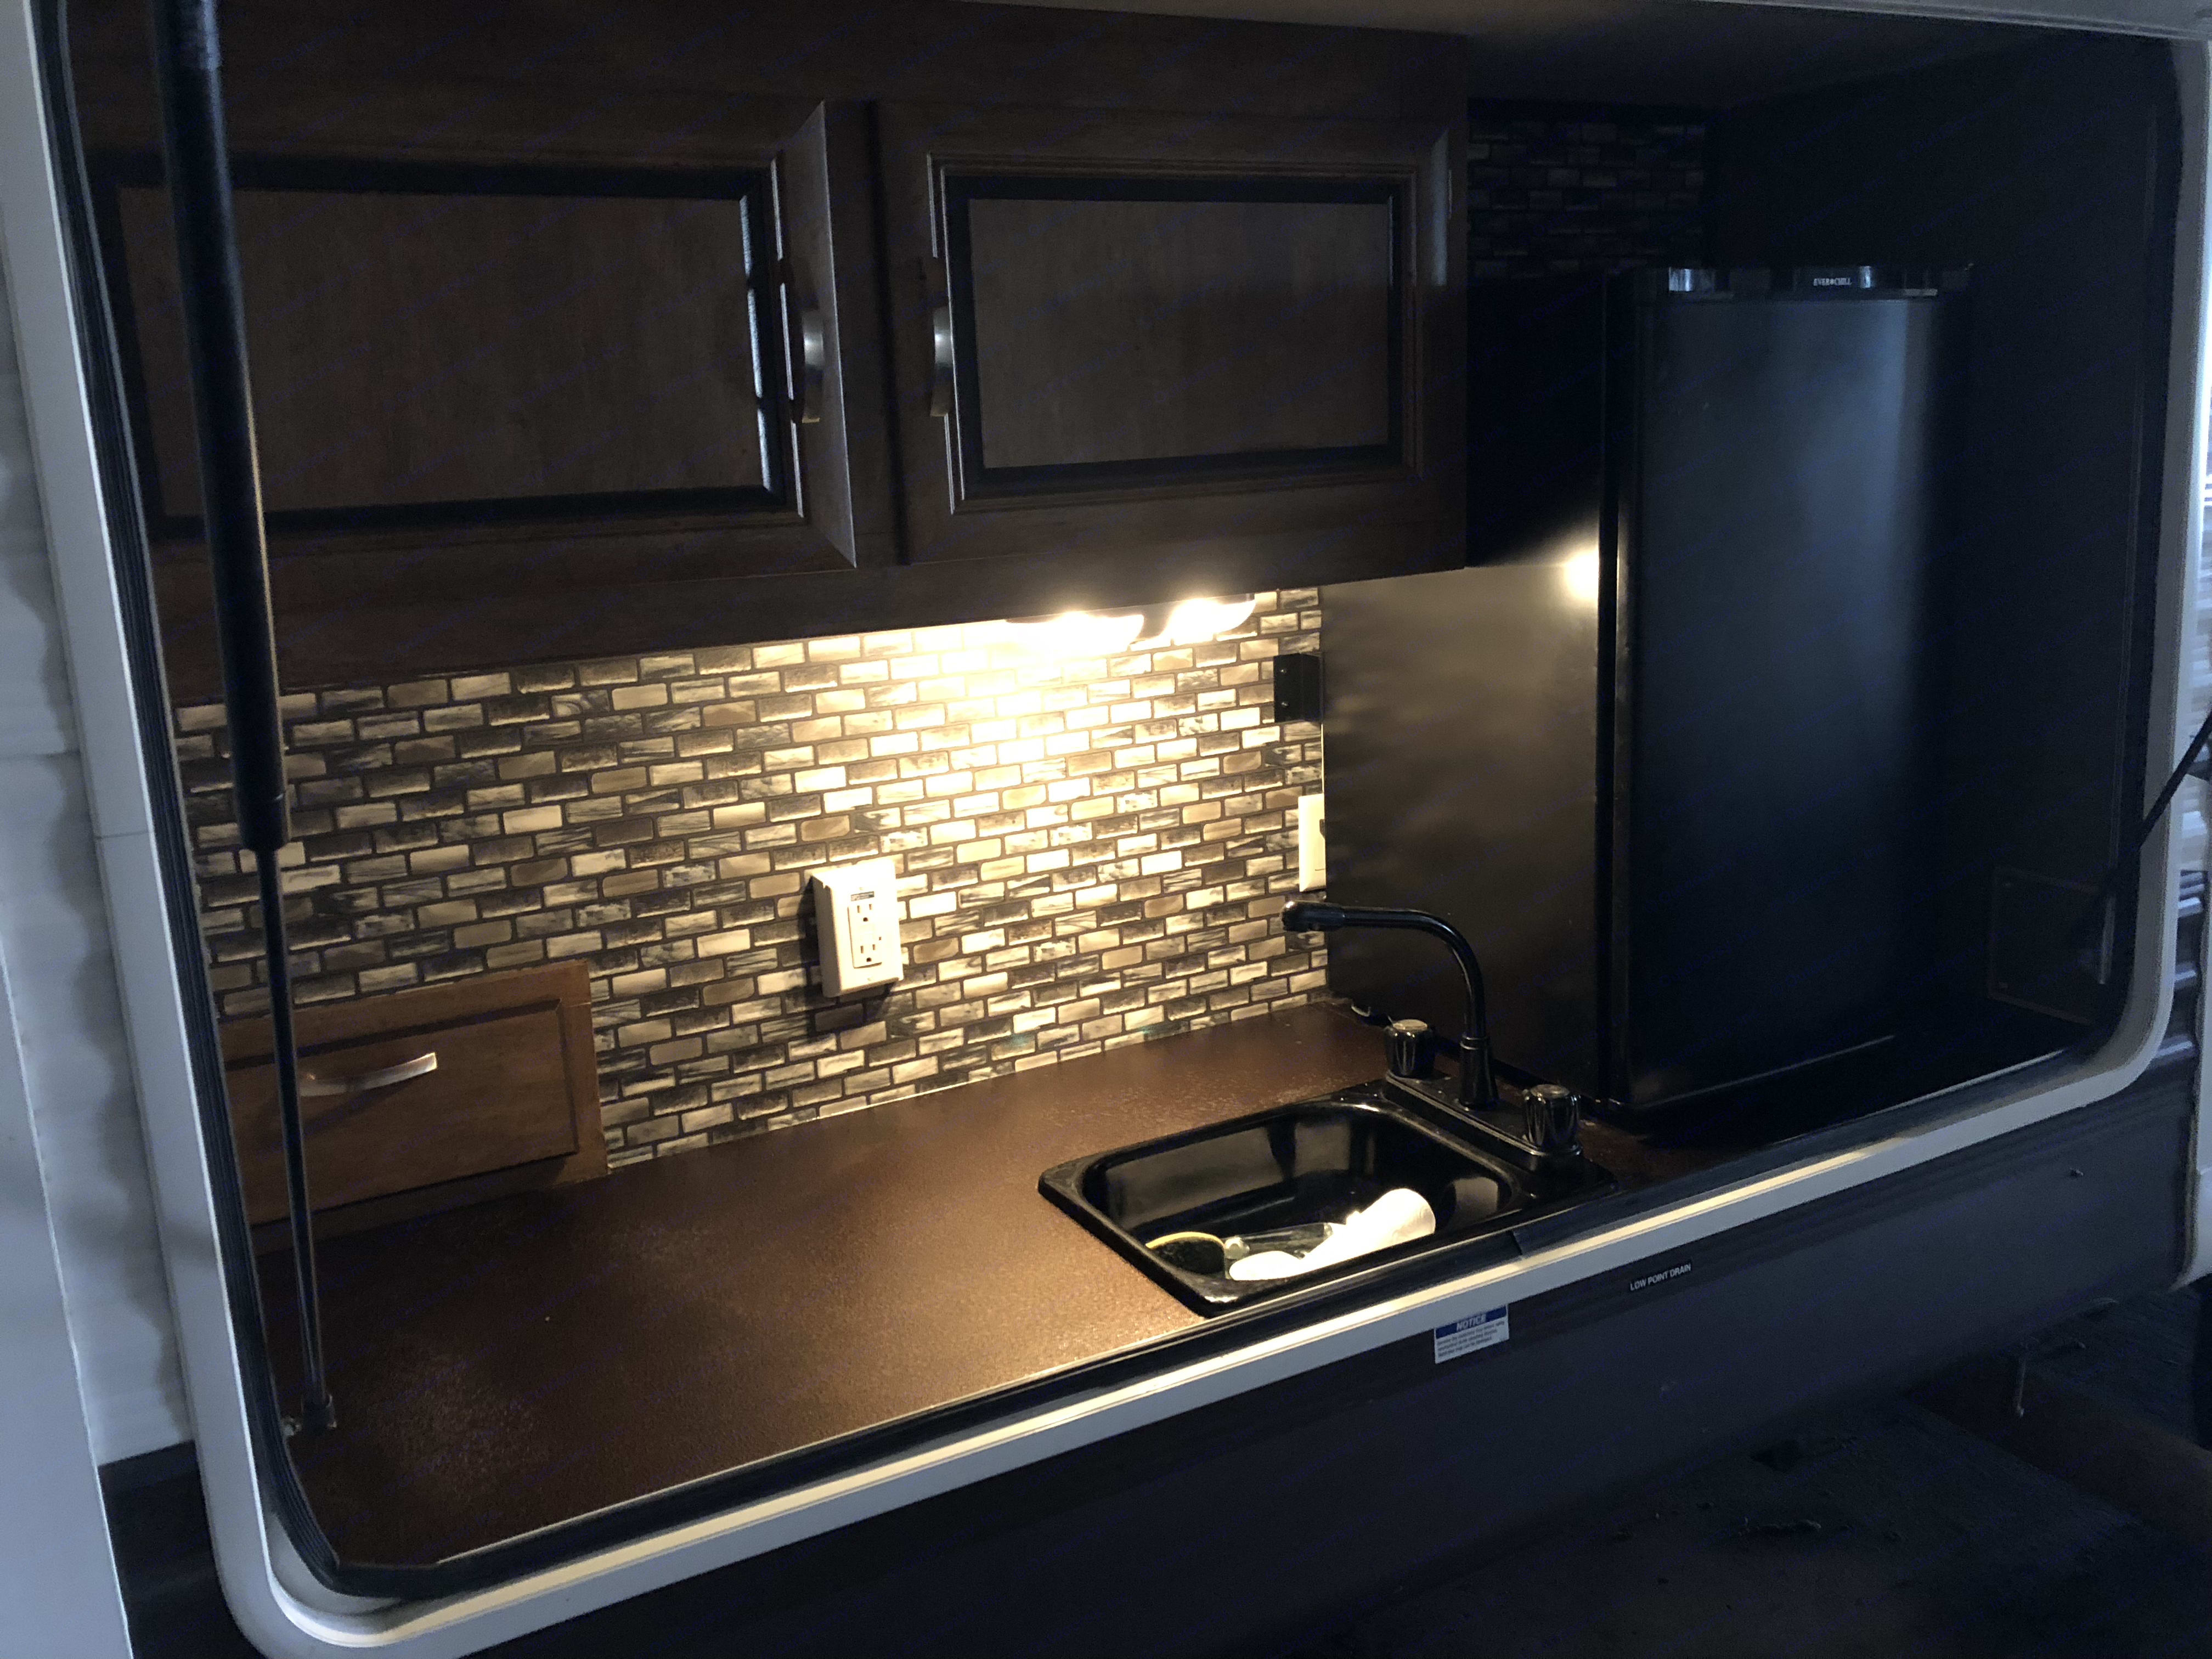 Outdoor kitchen with propane grill, refrigerator, sink & storage. . Wildwood 32qbss T31KQBTS 2015